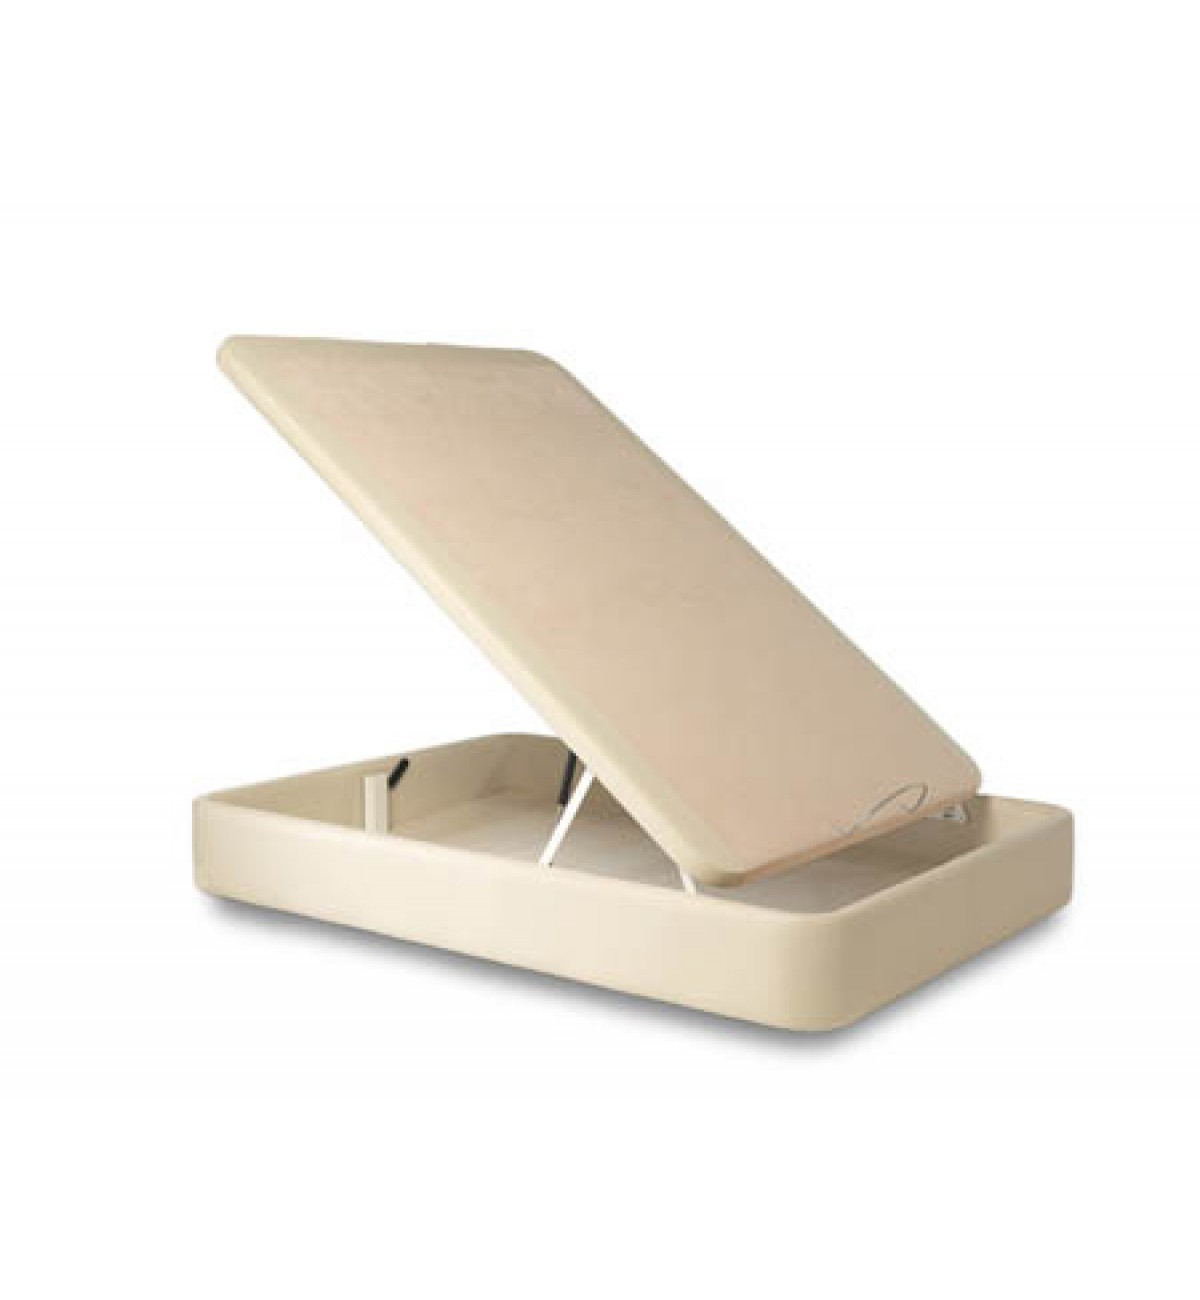 Canap abatible en polipiel madrid de dorminature compre for Canape online